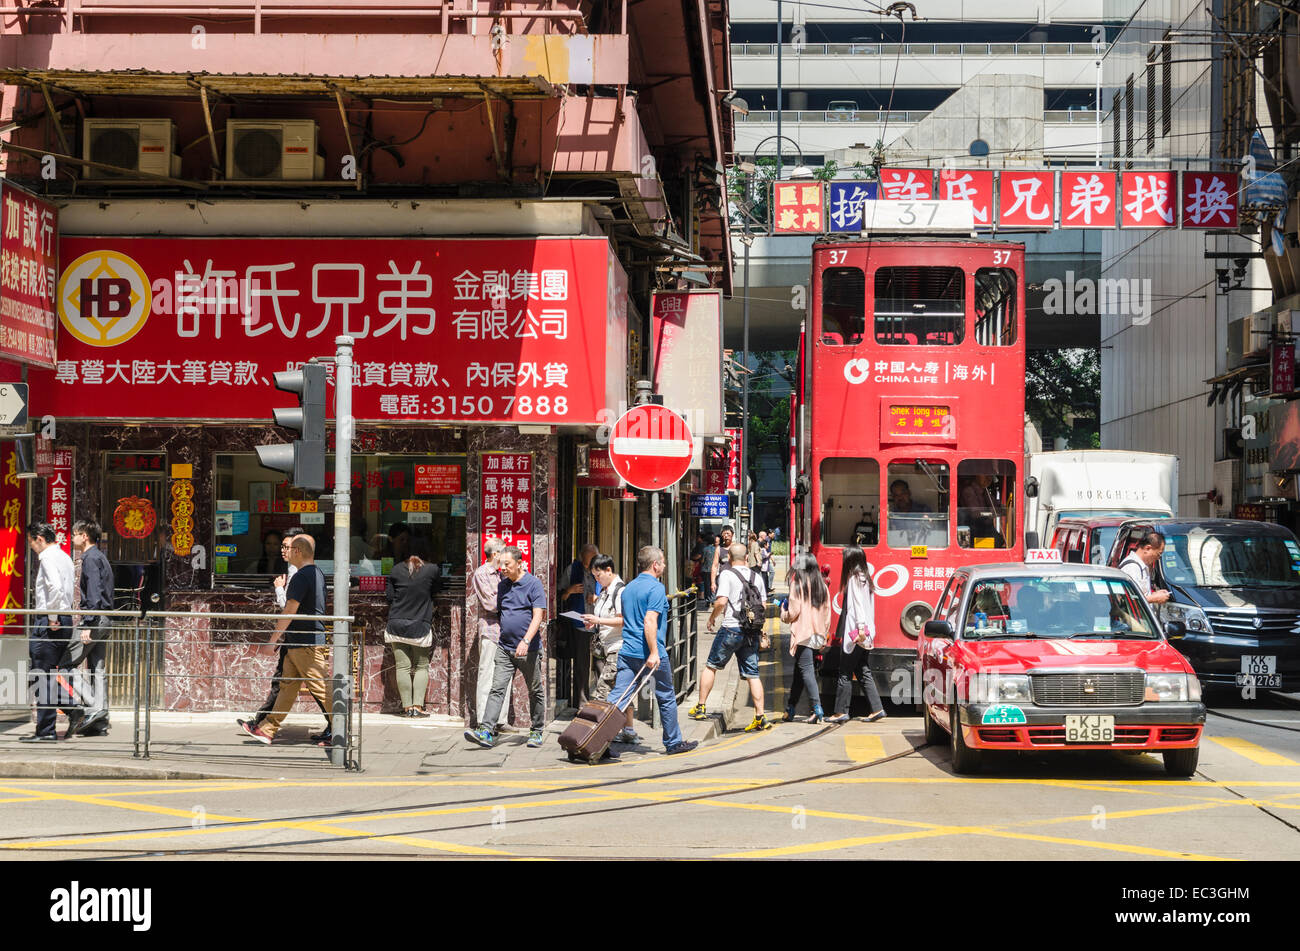 Occupé à l'île de Hong Kong, scène de rue à Sheung Wan, Hong Kong, Chine Photo Stock